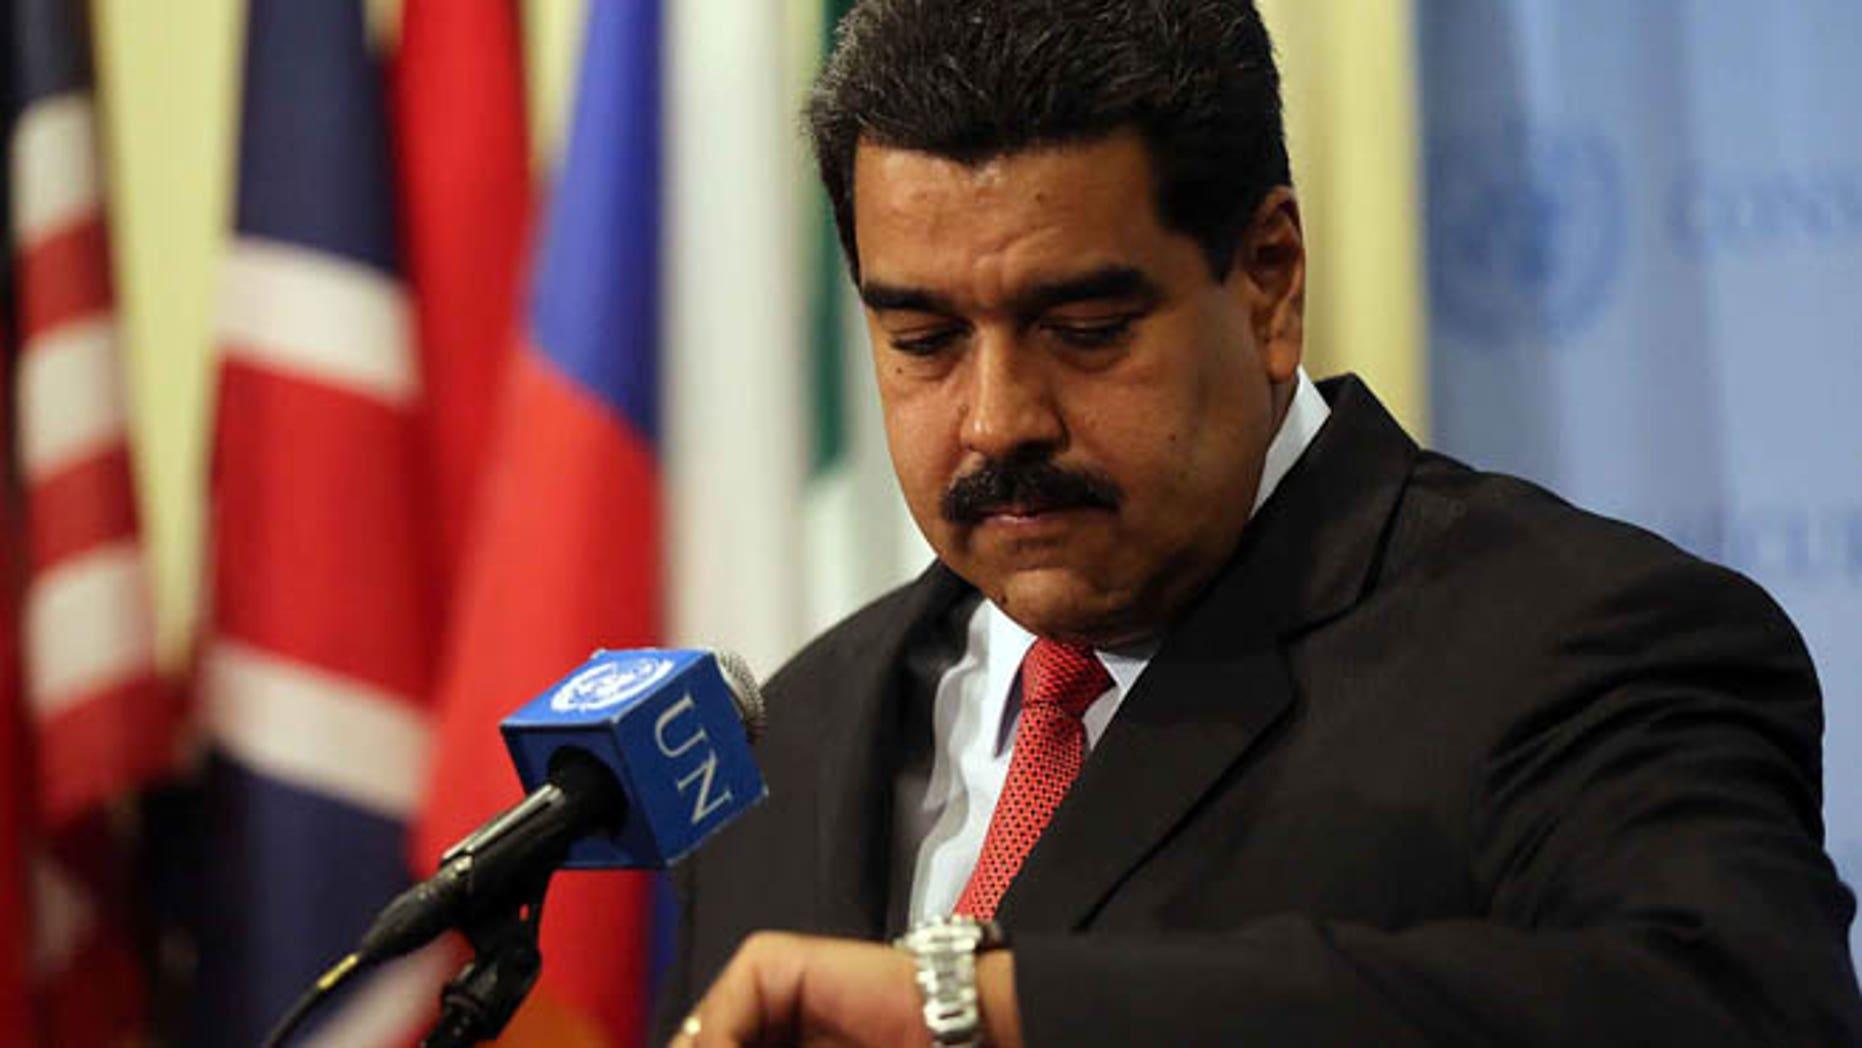 Venezuelan President Nicolas Maduro on July 28, 2015 in New York City.